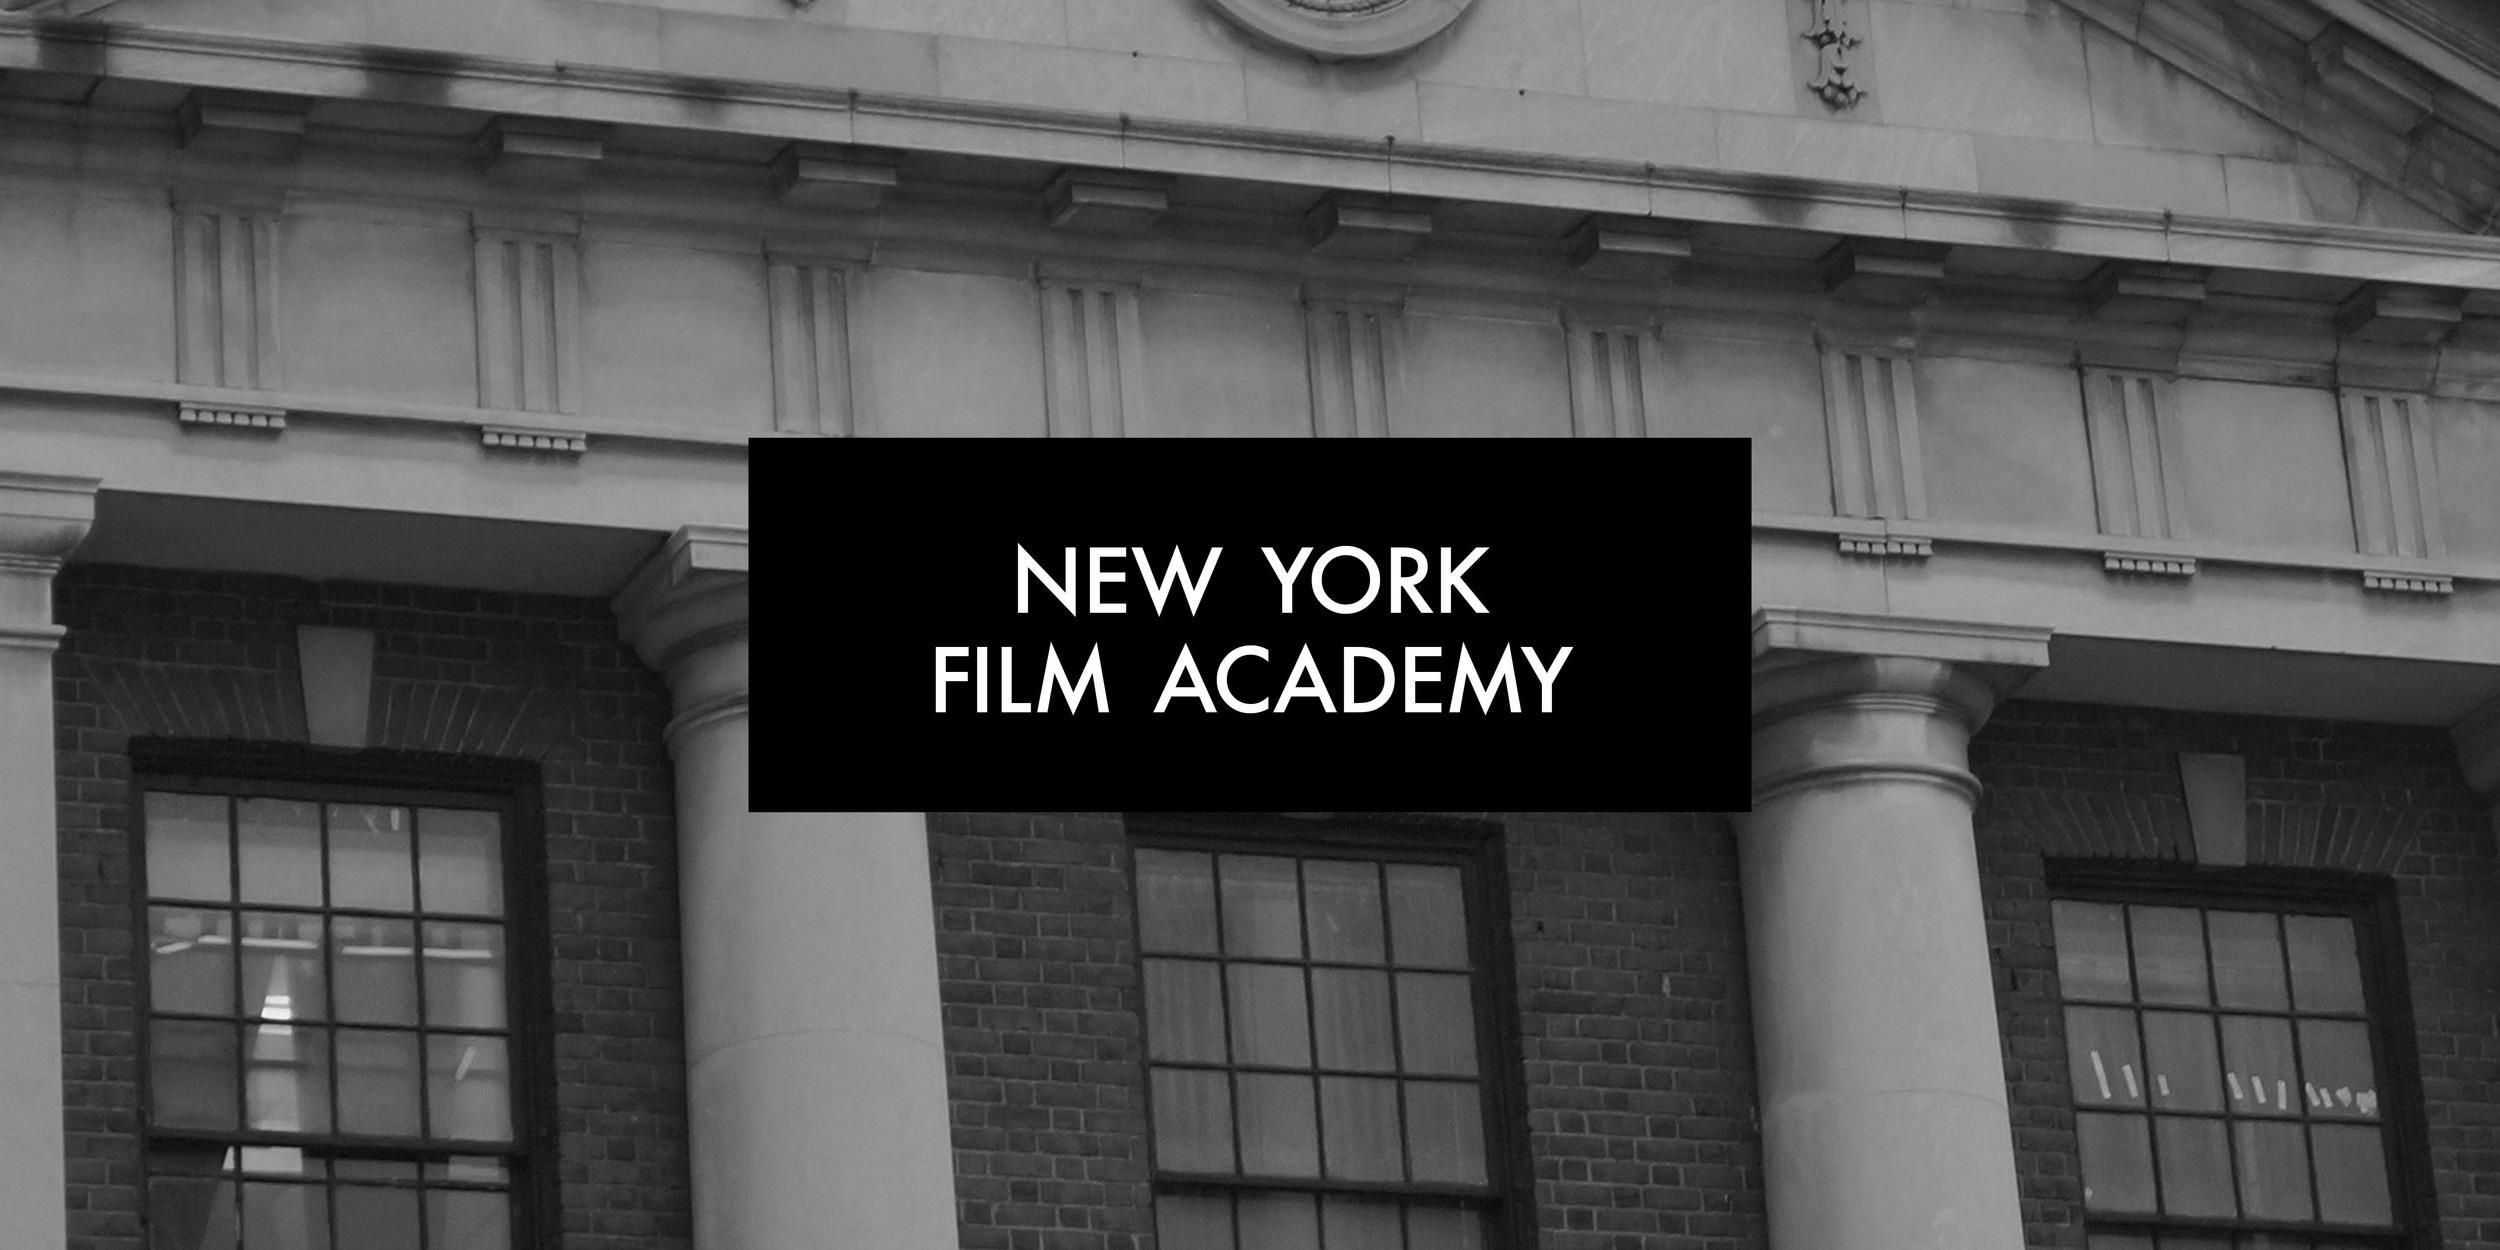 Evan_Foster_NewYorkFilmAcademy